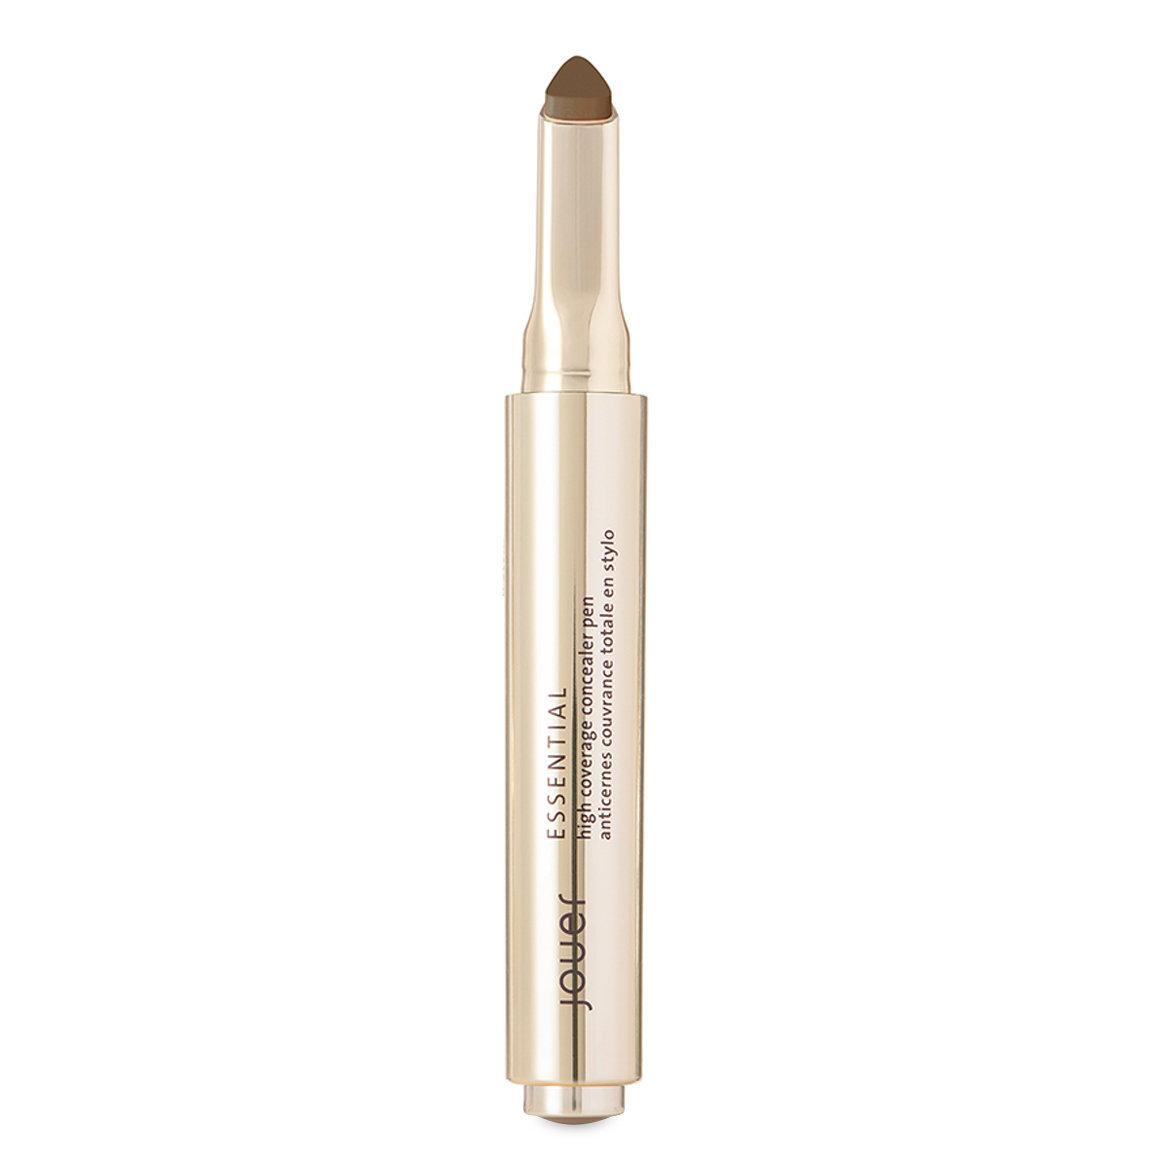 Jouer Cosmetics Essential High Coverage Concealer Pen Dark Ochre alternative view 1.